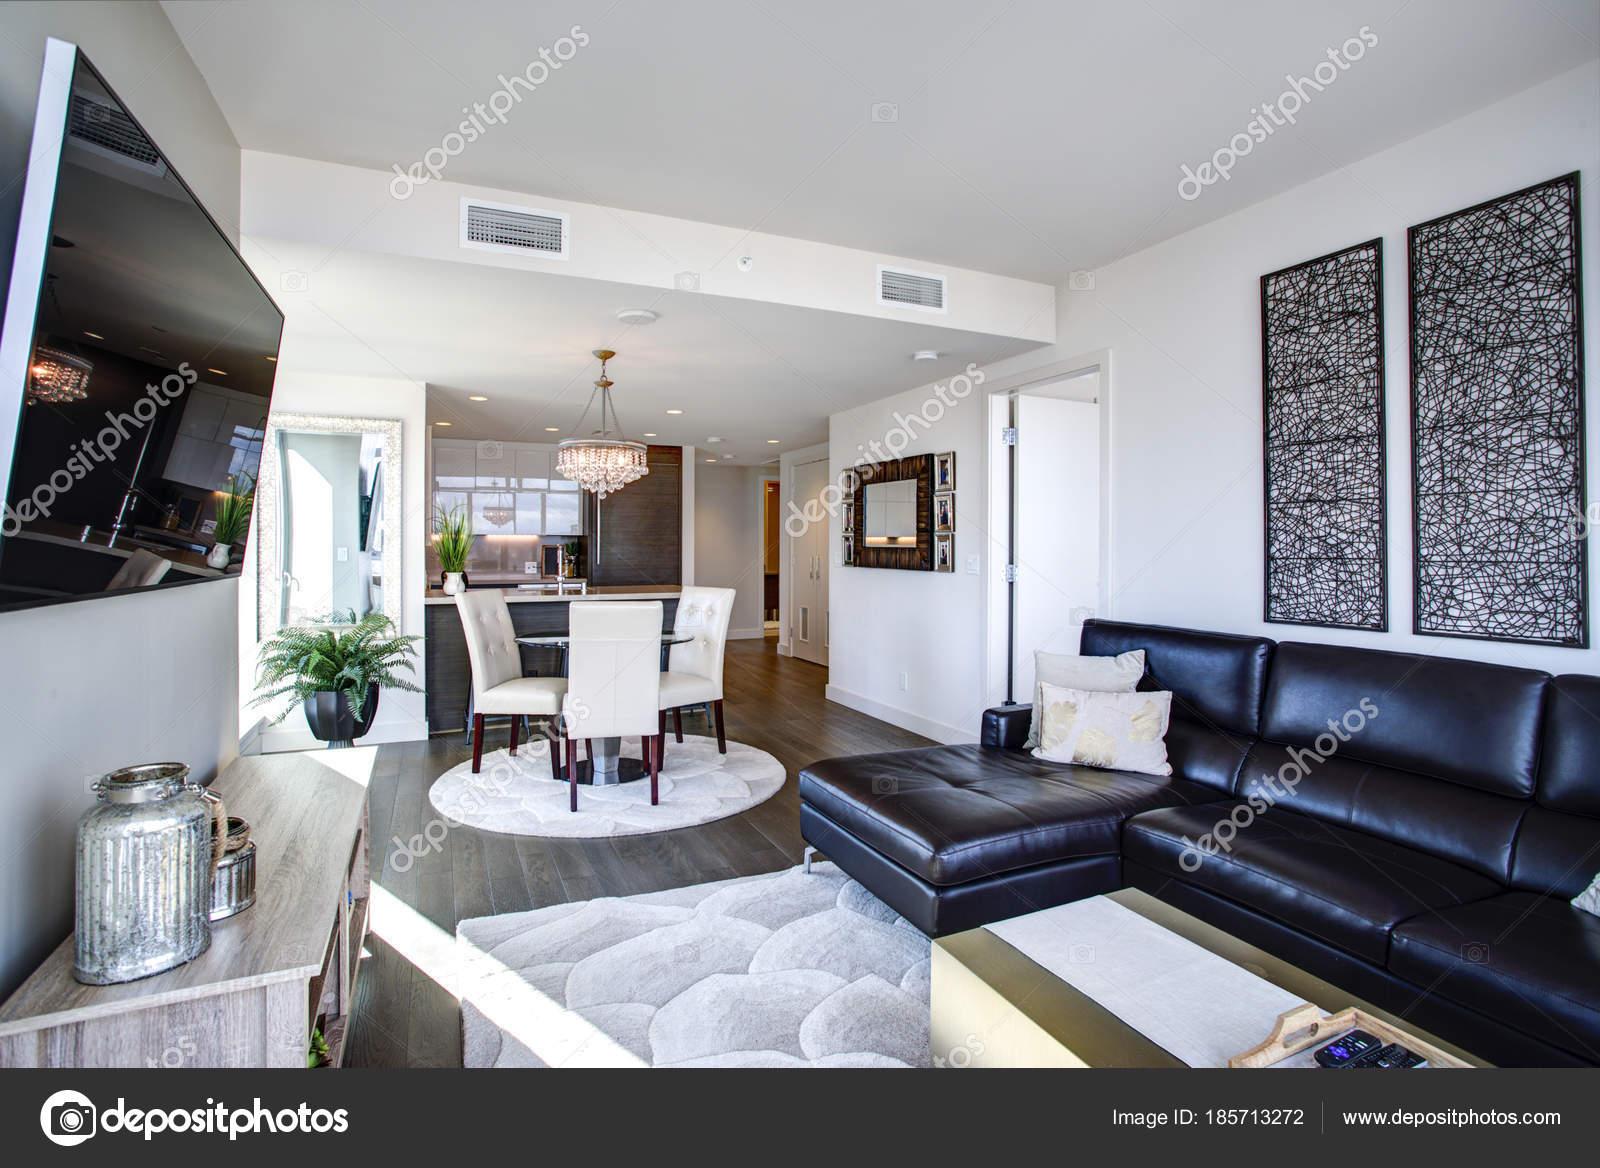 Zwart-wit woonkamer met modern design — Stockfoto © alabn #185713272